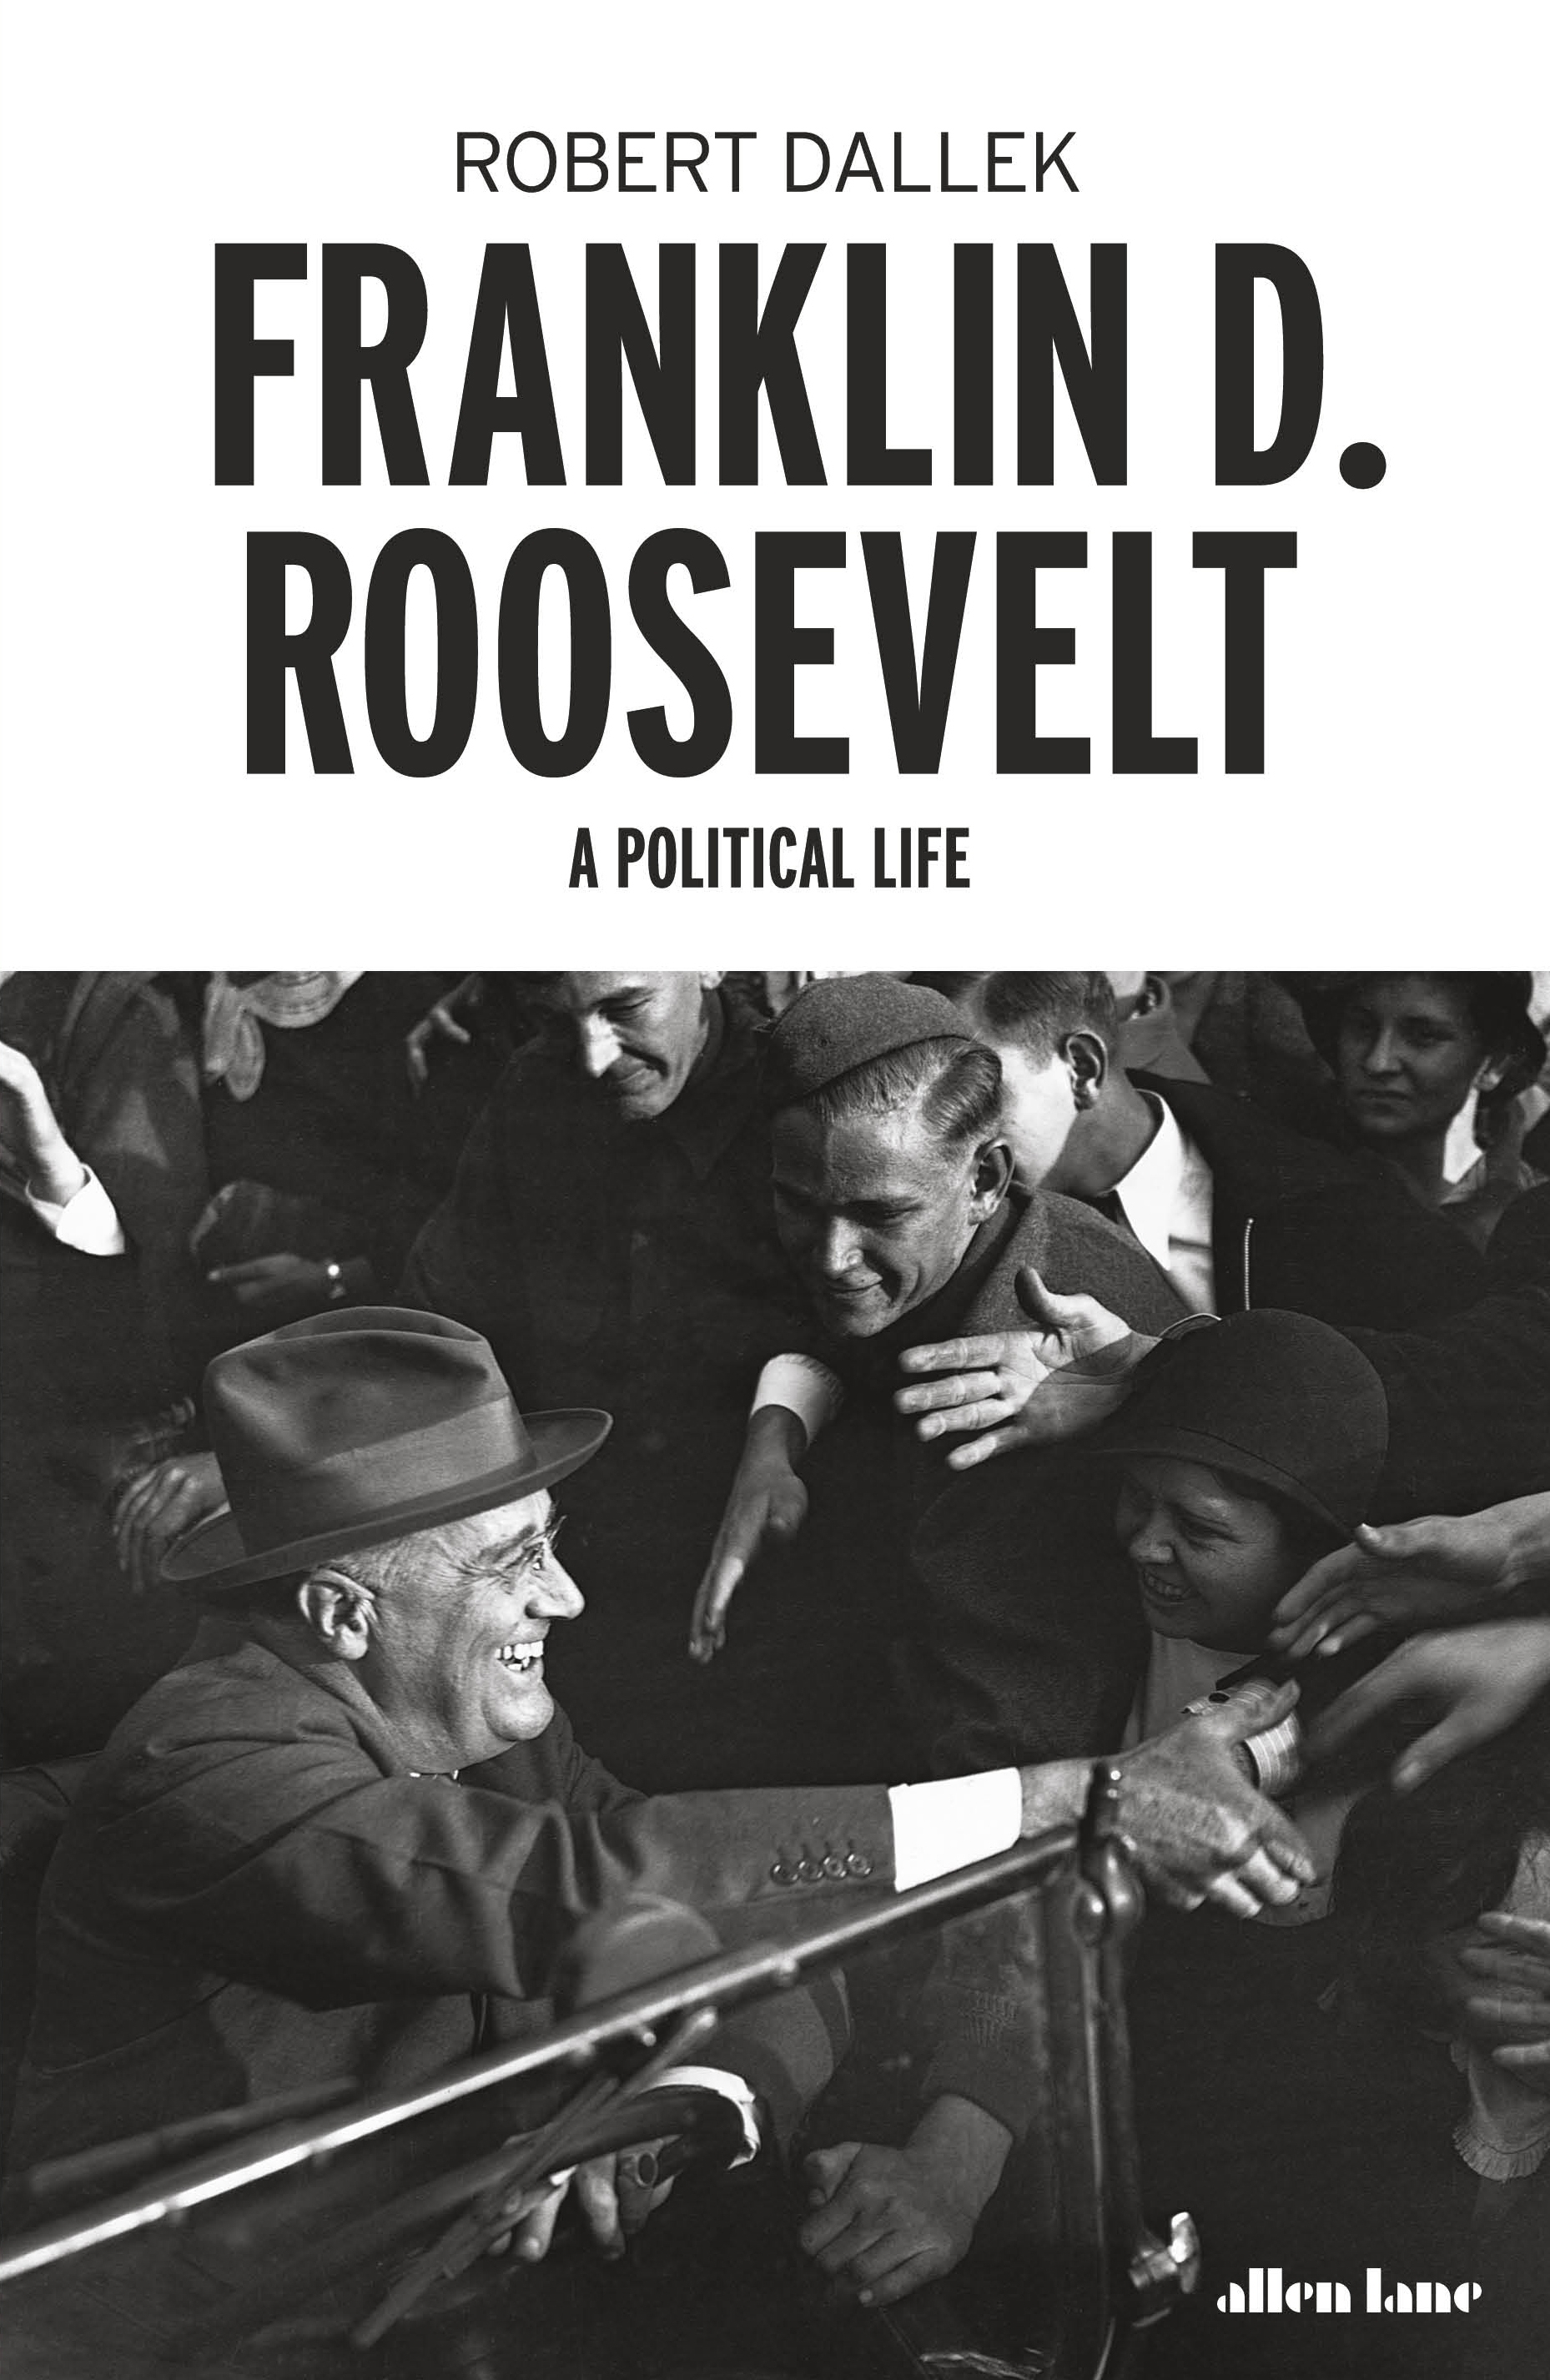 A Political Life - Robert Dallek